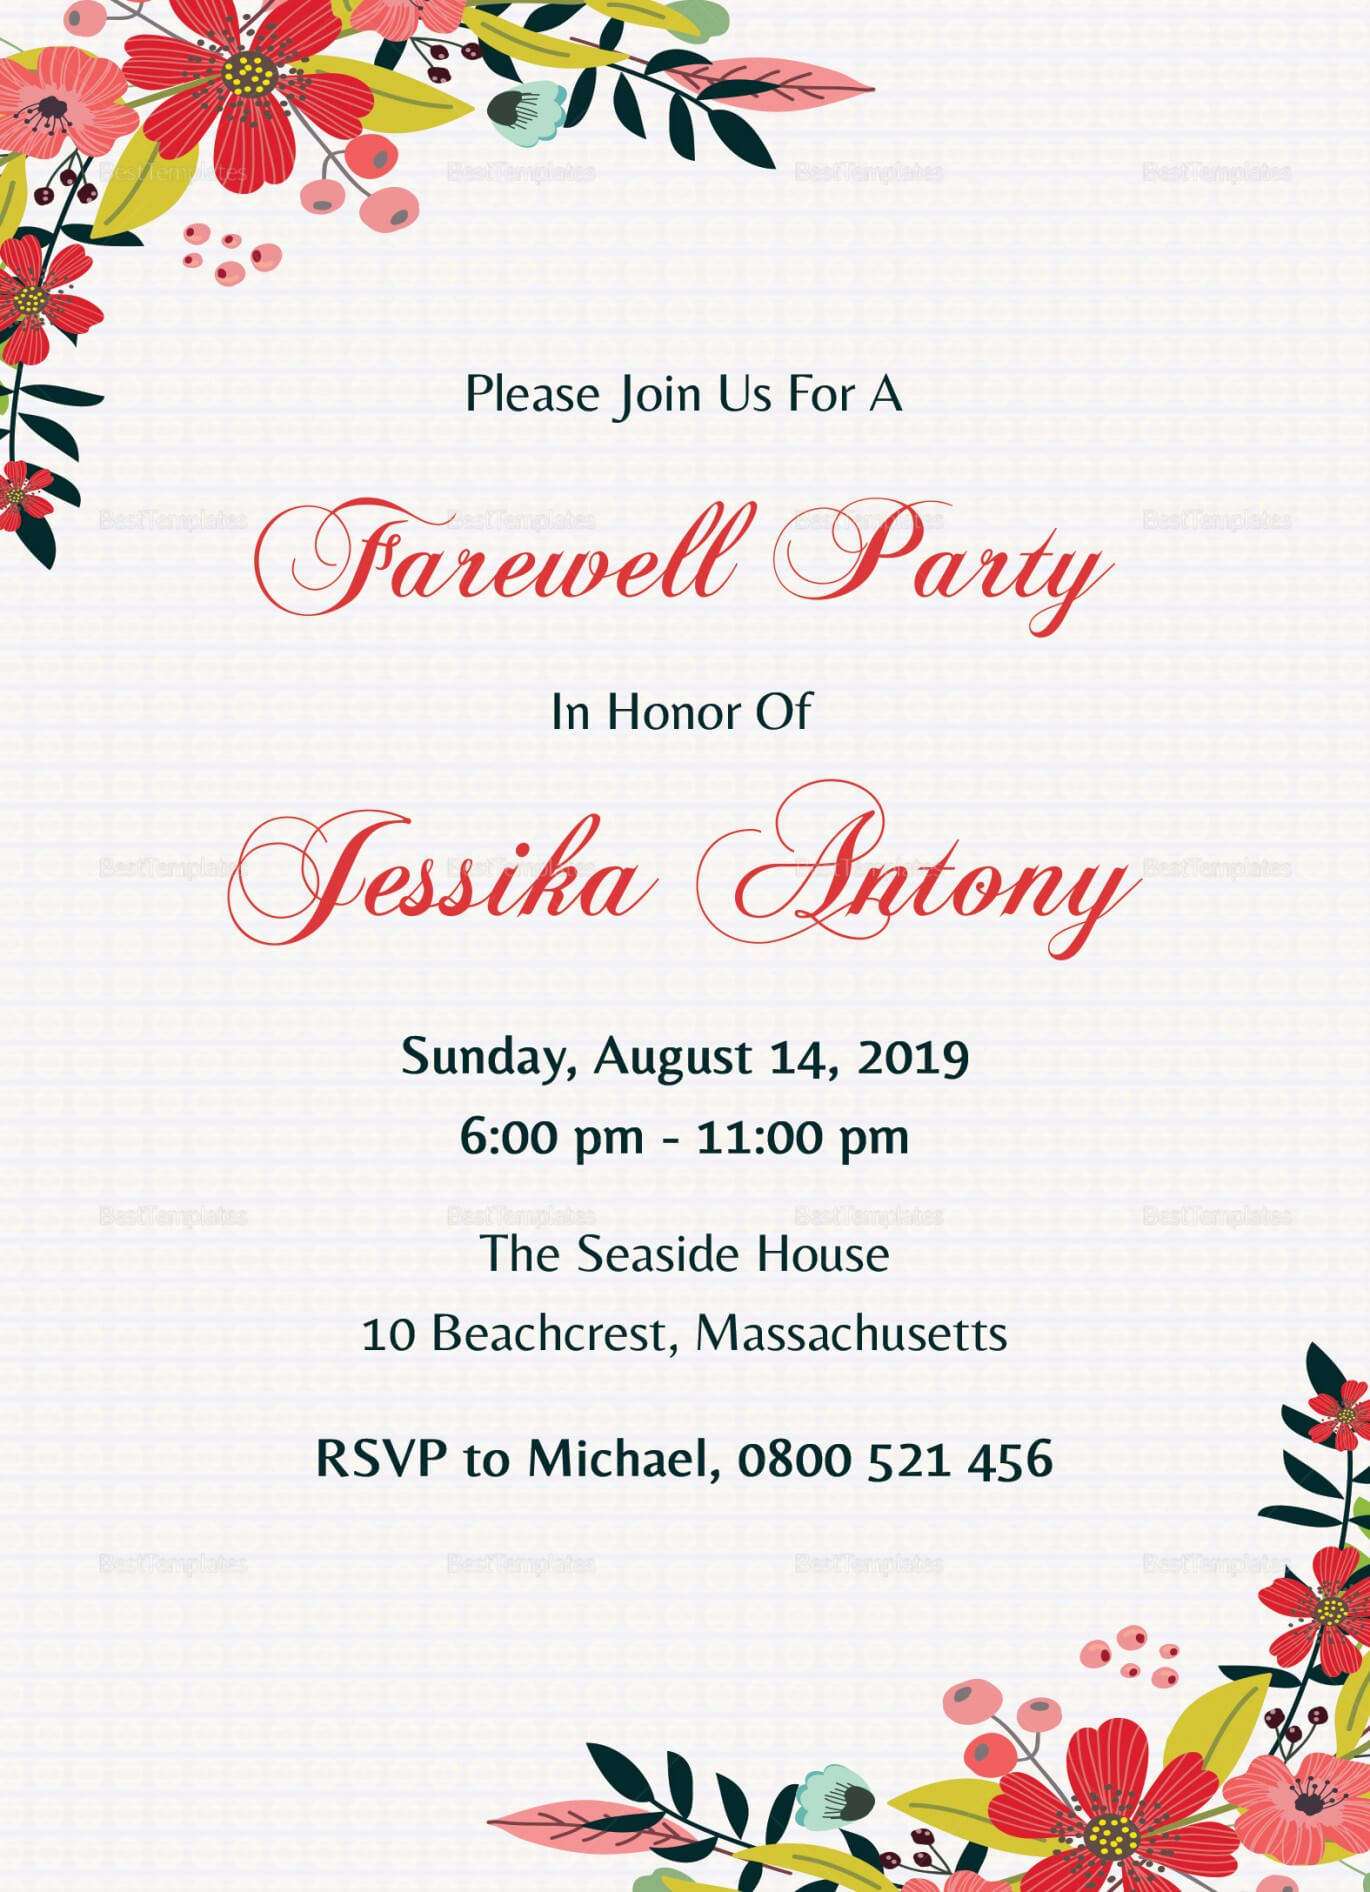 023 Template Ideas Farewell Invitation Free Party Throughout Farewell Invitation Card Template